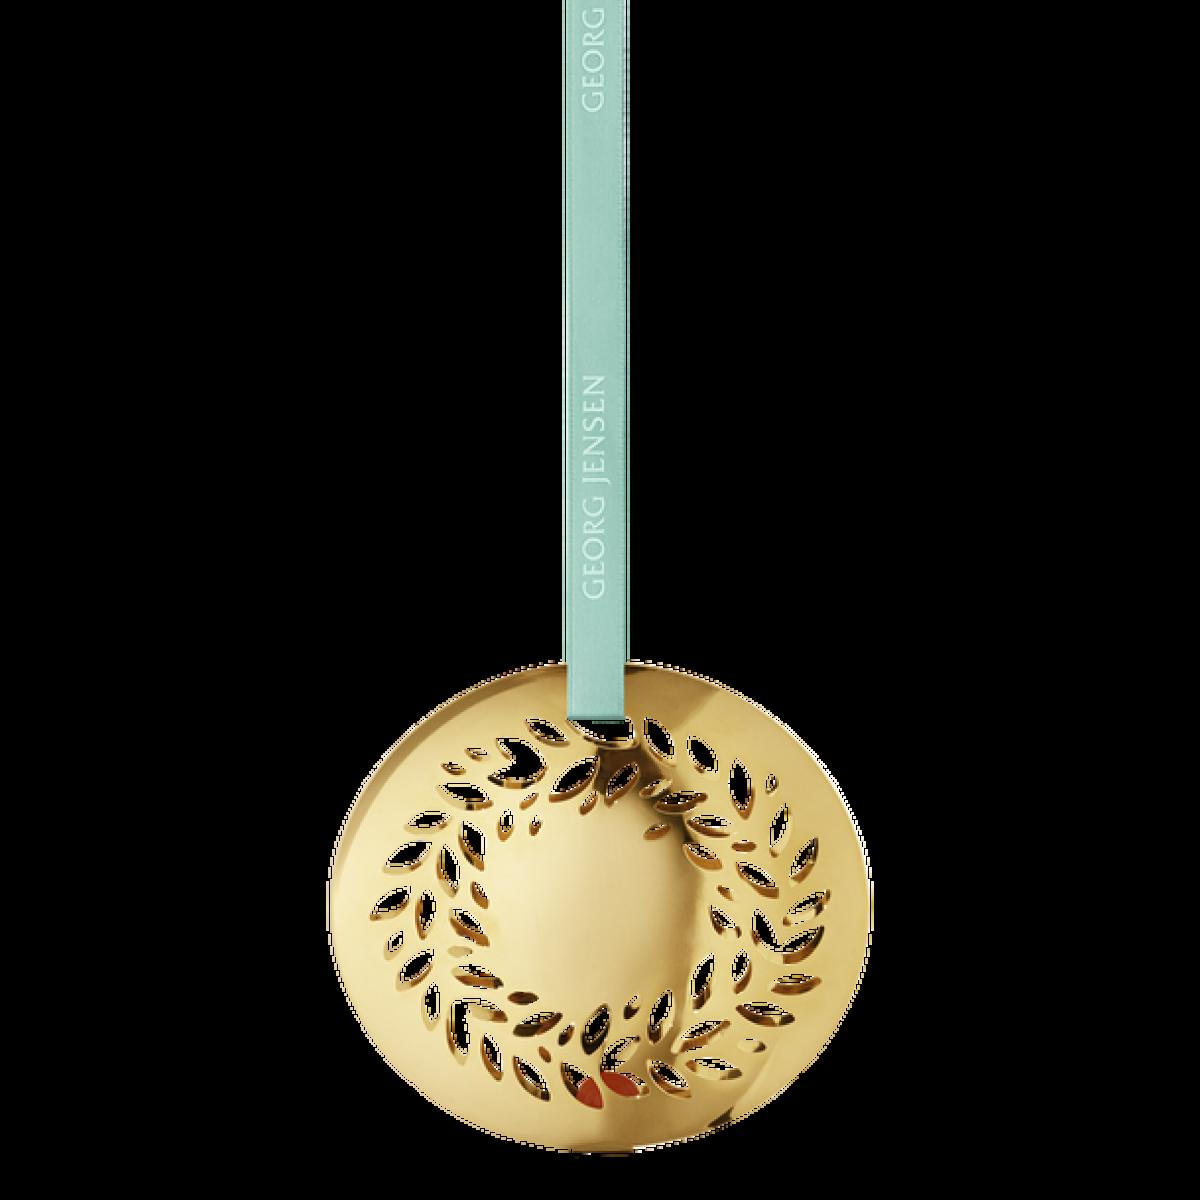 GEORG JENSEN Juleuro magnoliakrans guldbelagt 2016